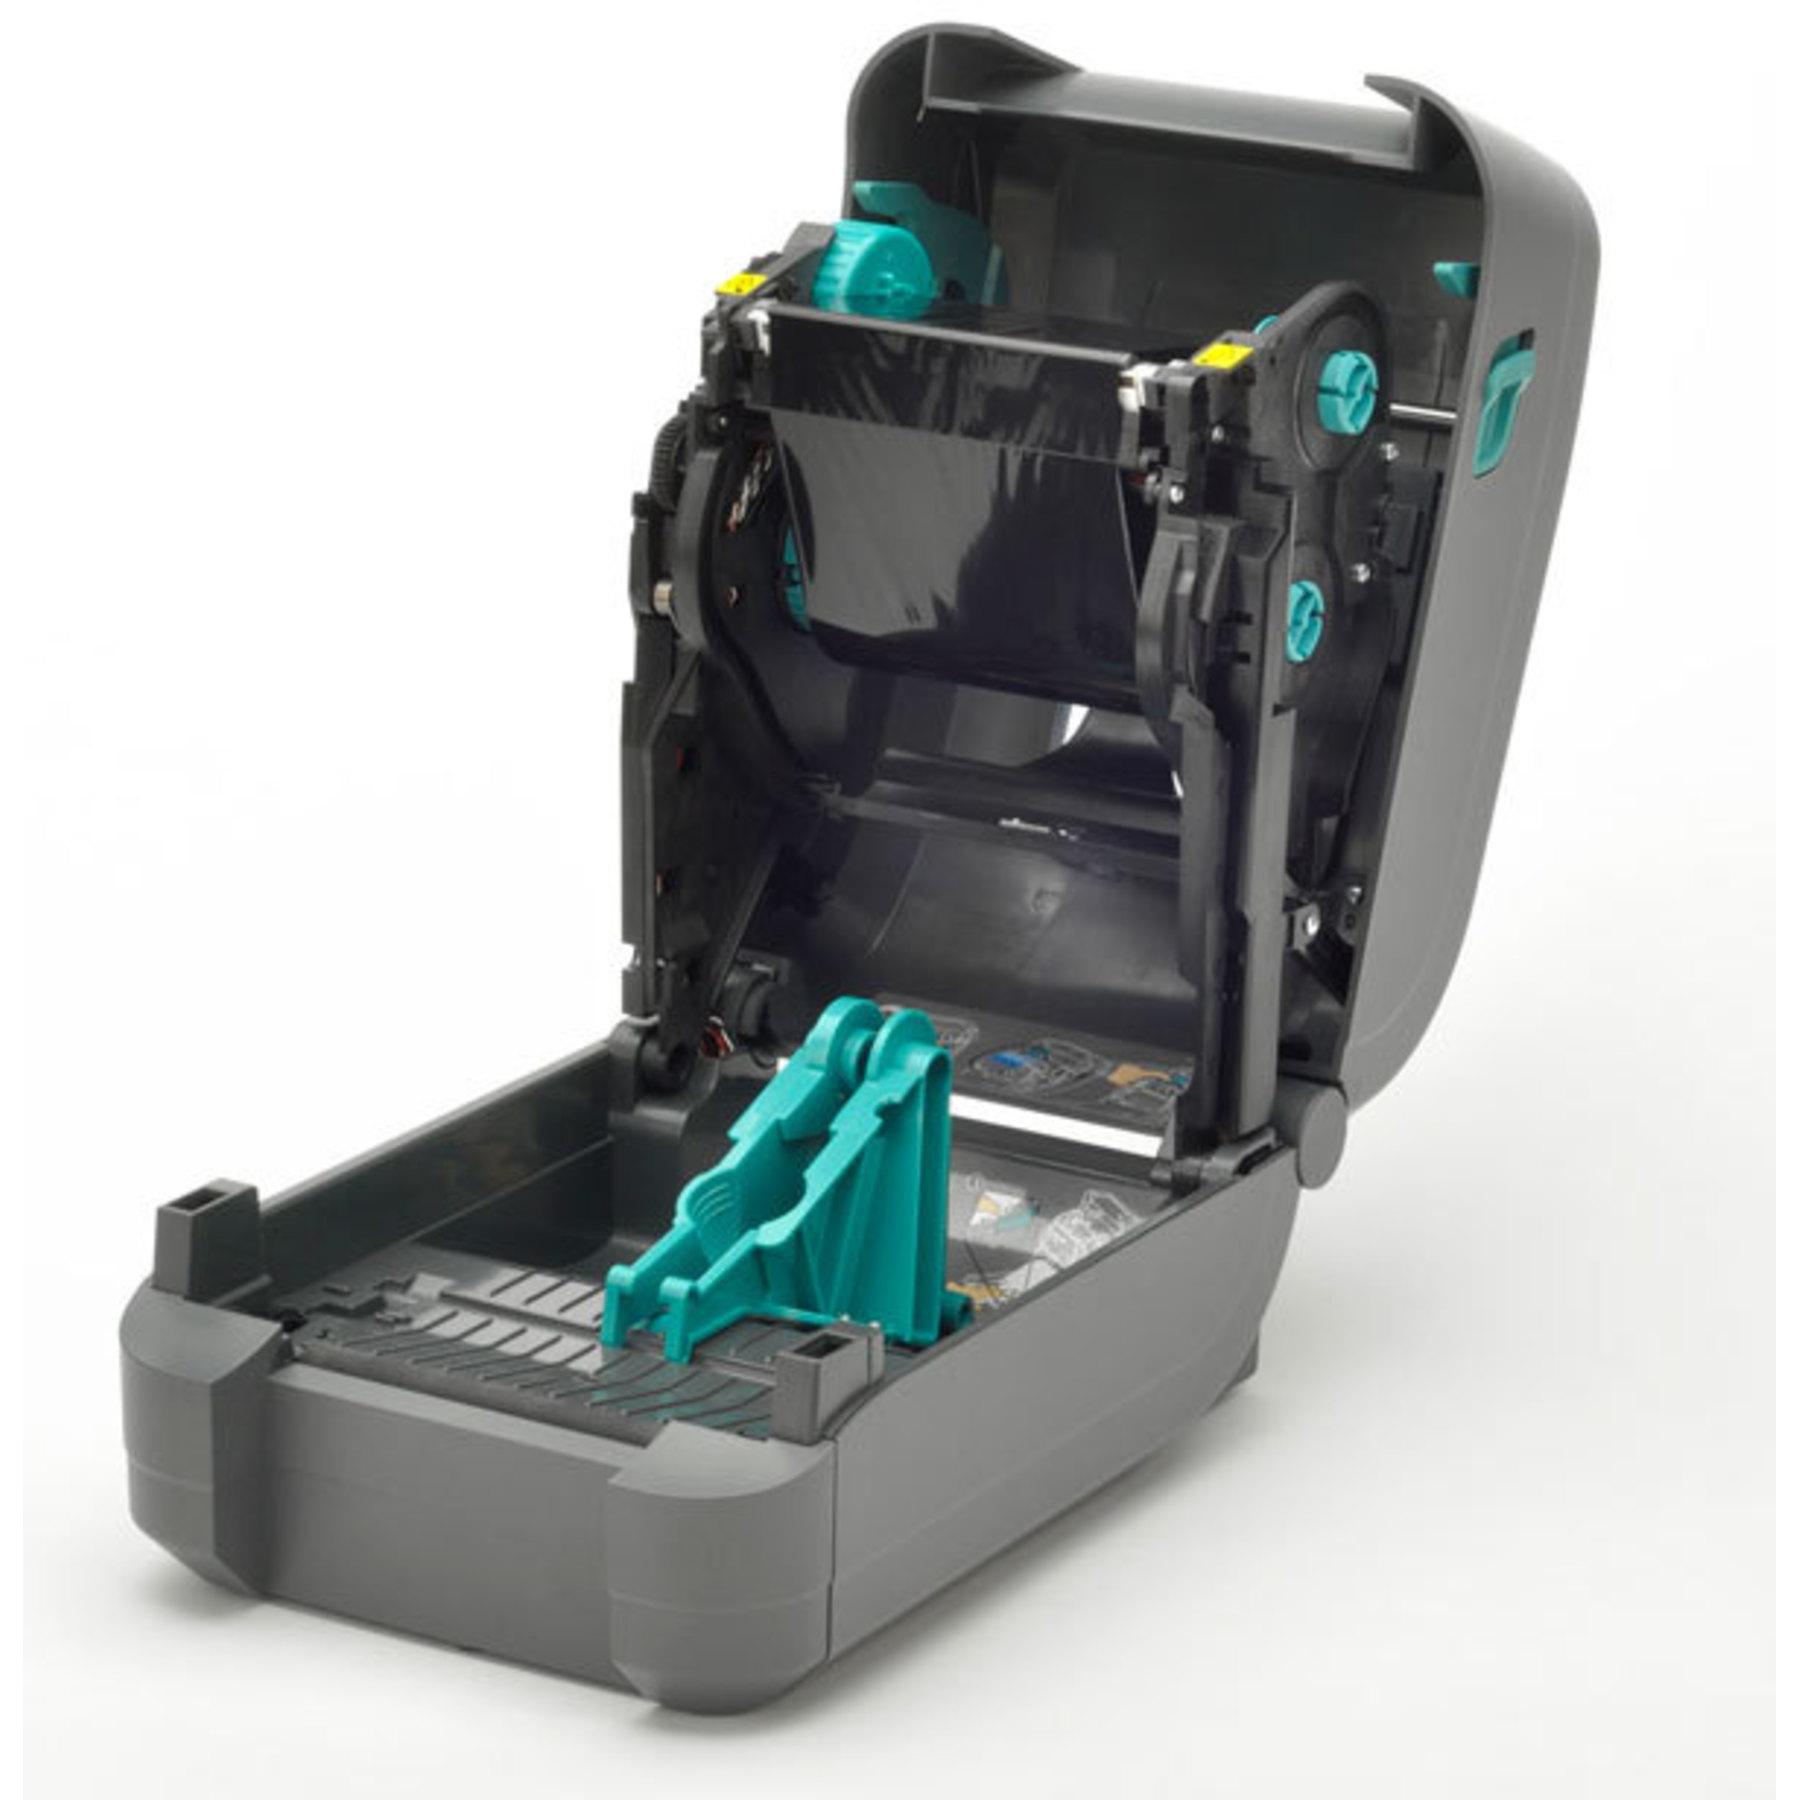 Zebra Gt800 Desktop Label Printer Cash Drawers Ireland